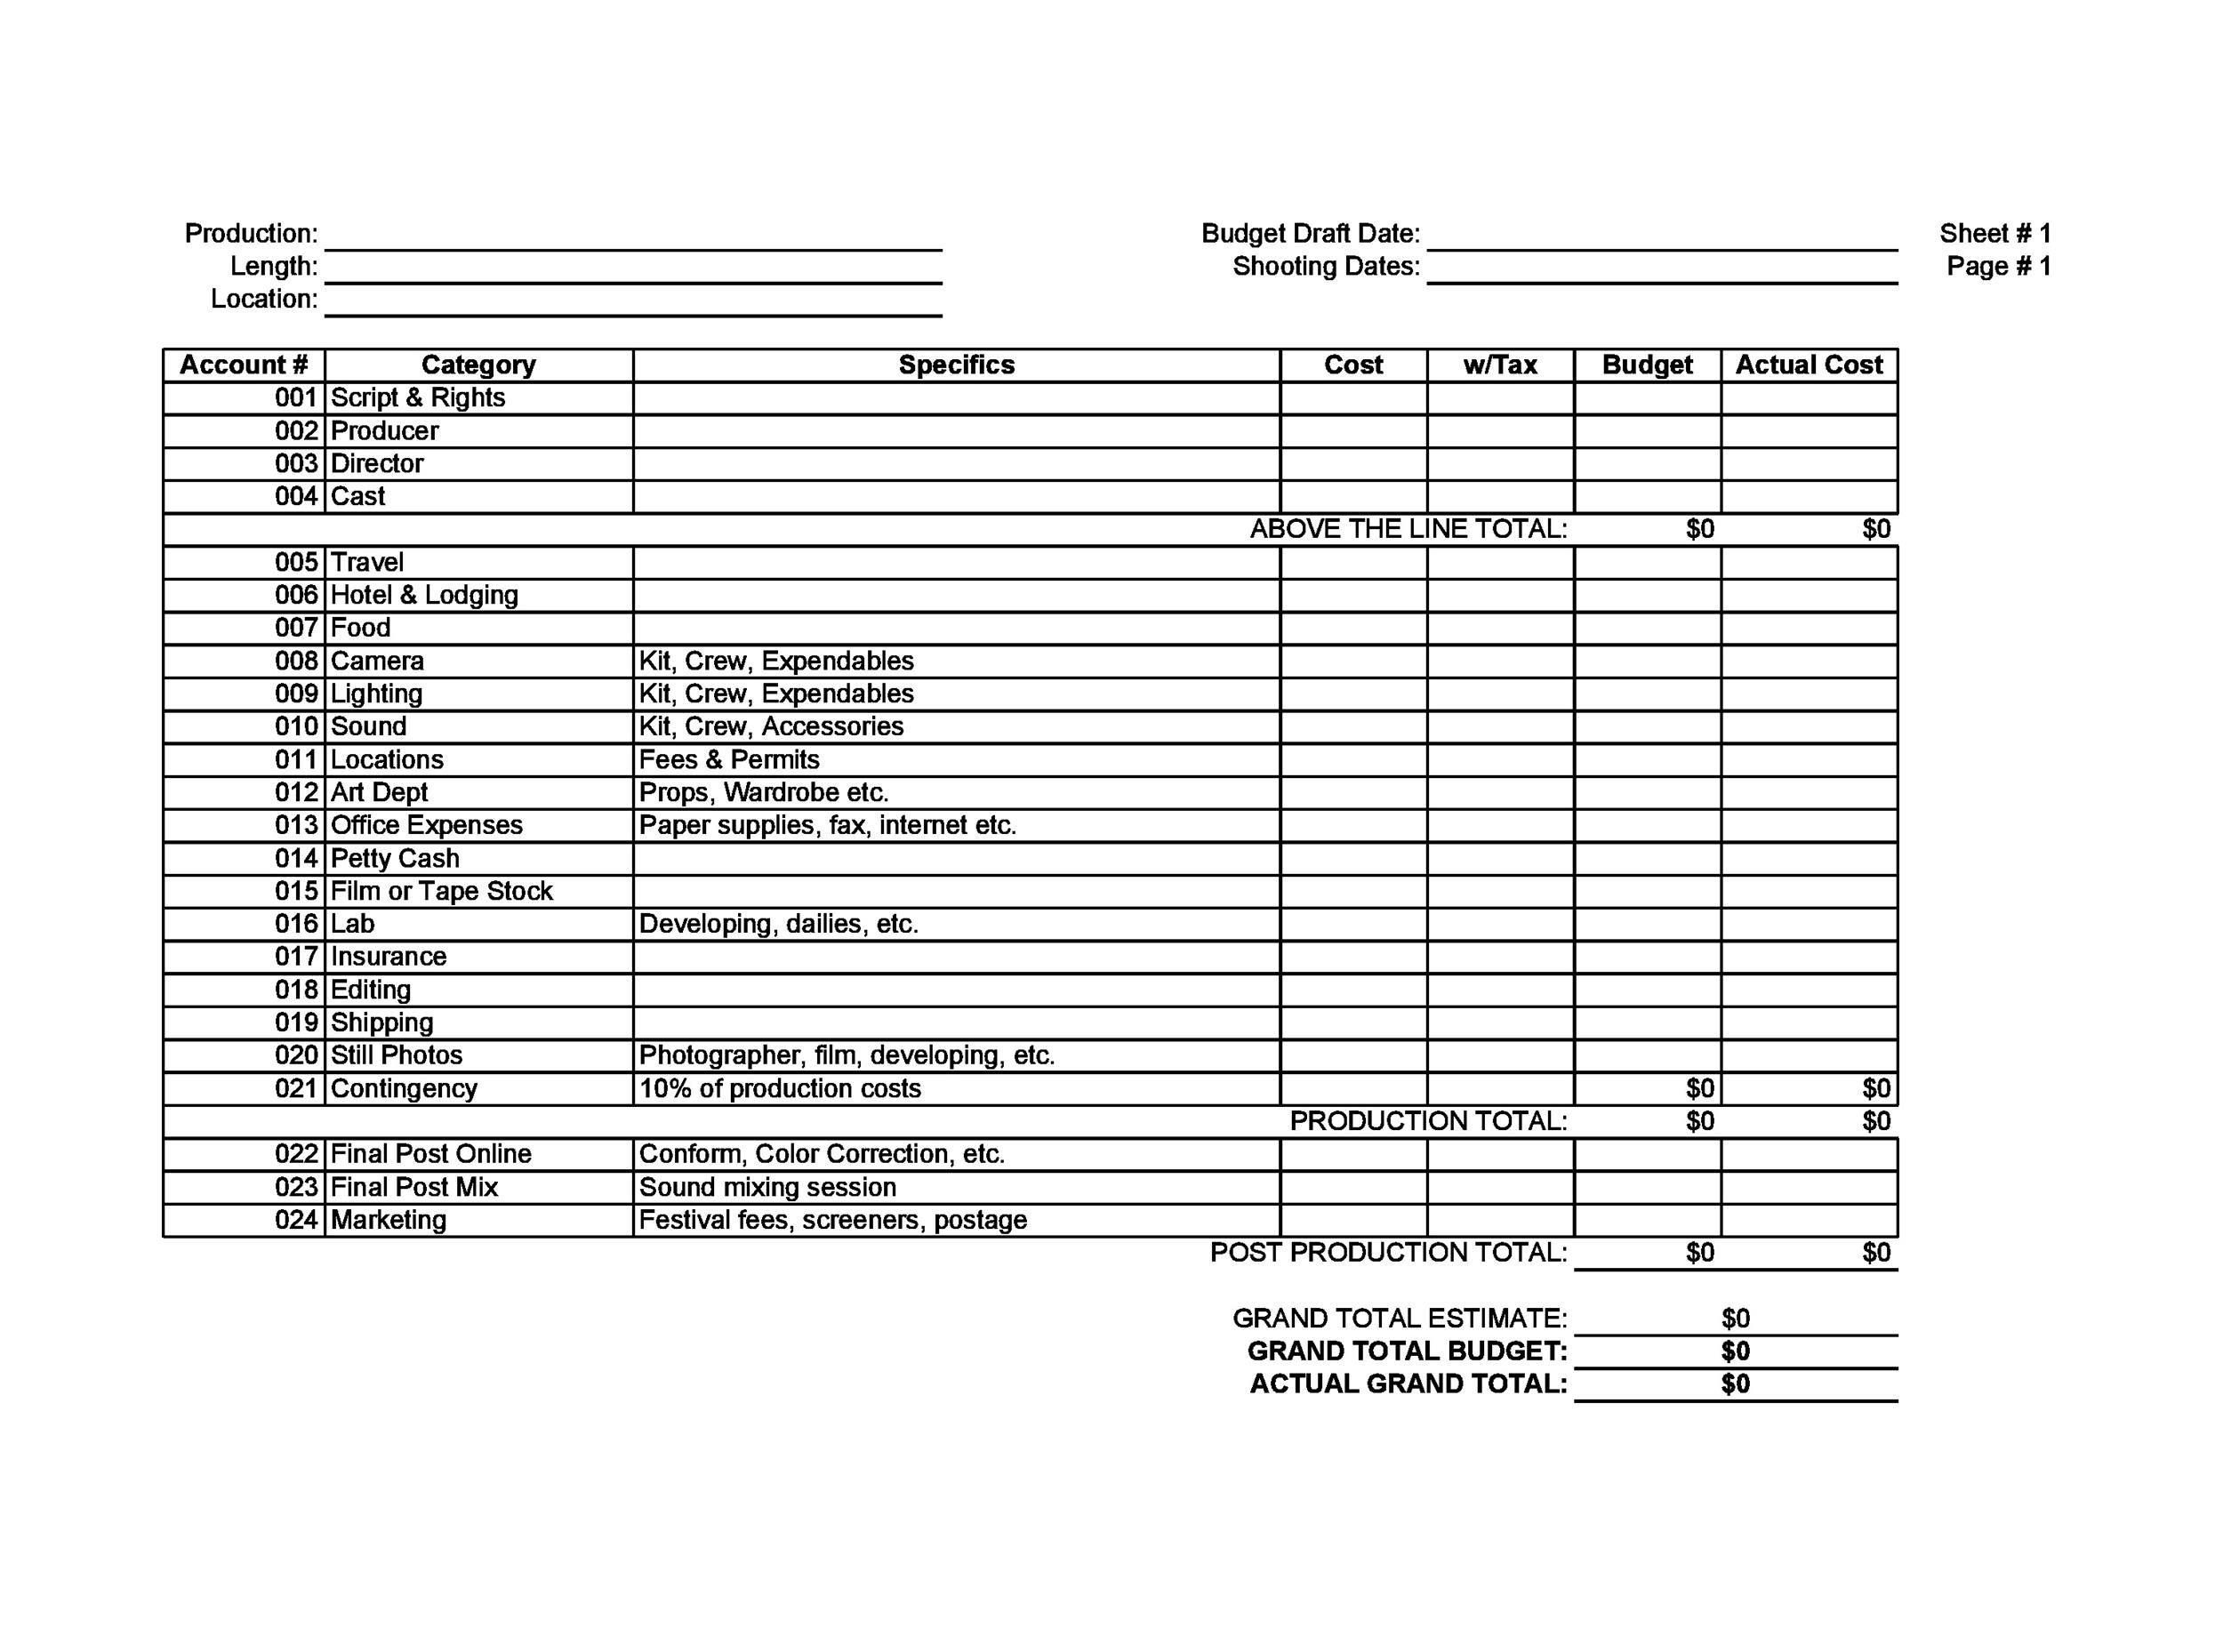 008 Breathtaking Sample Line Item Budget Format Inspiration Full